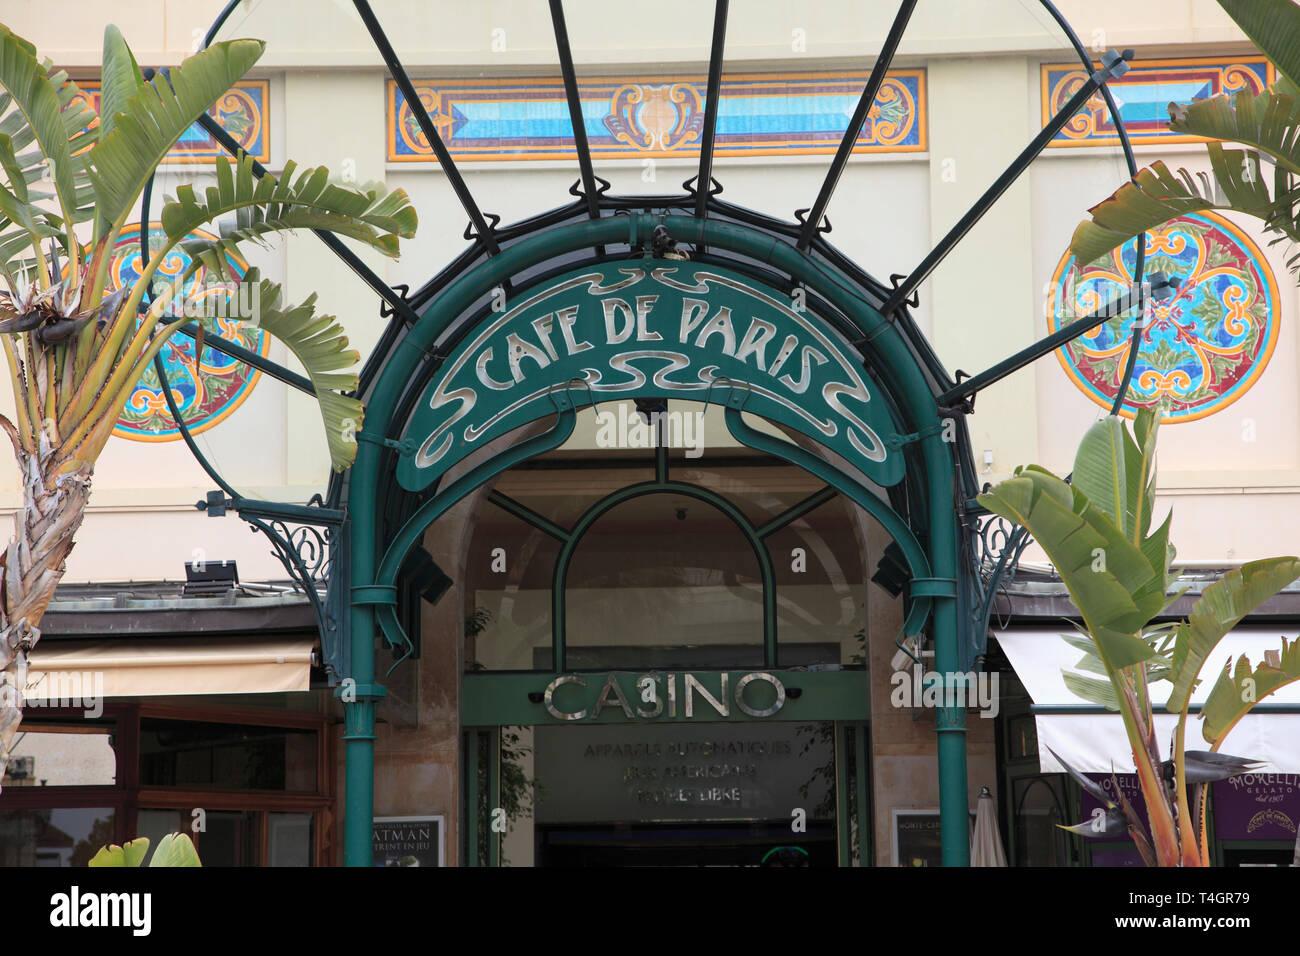 Cafe de Paris, Casino Entrance, Monte Carlo, Monaco, Cote d Azur, Mediterranean, Europe - Stock Image